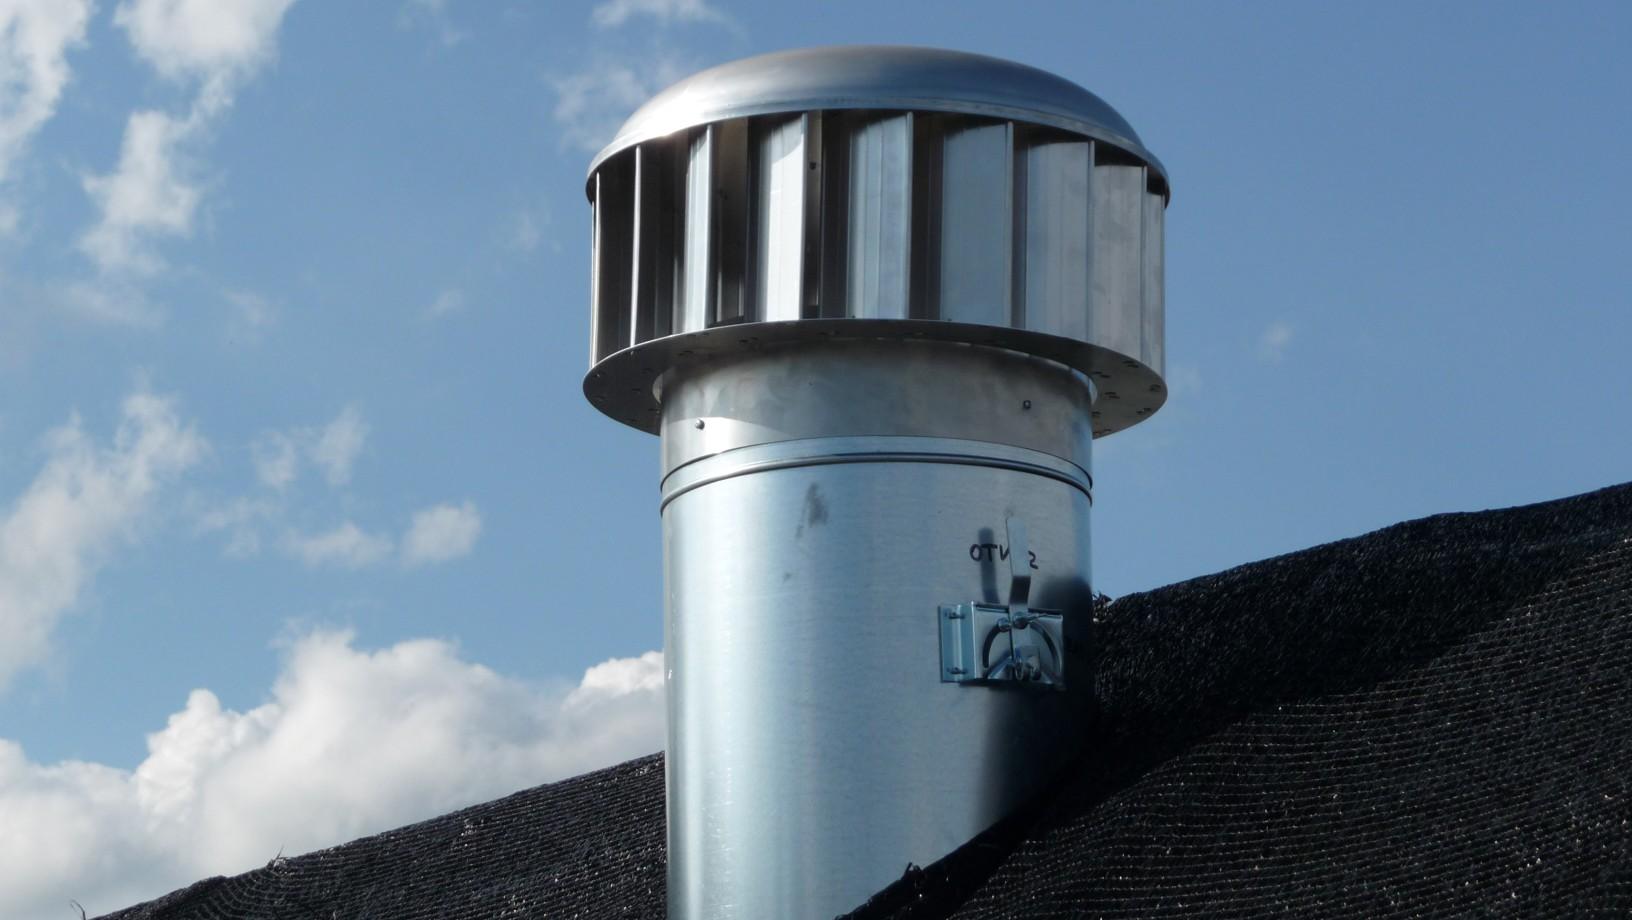 Fairair ventilacni turbiny